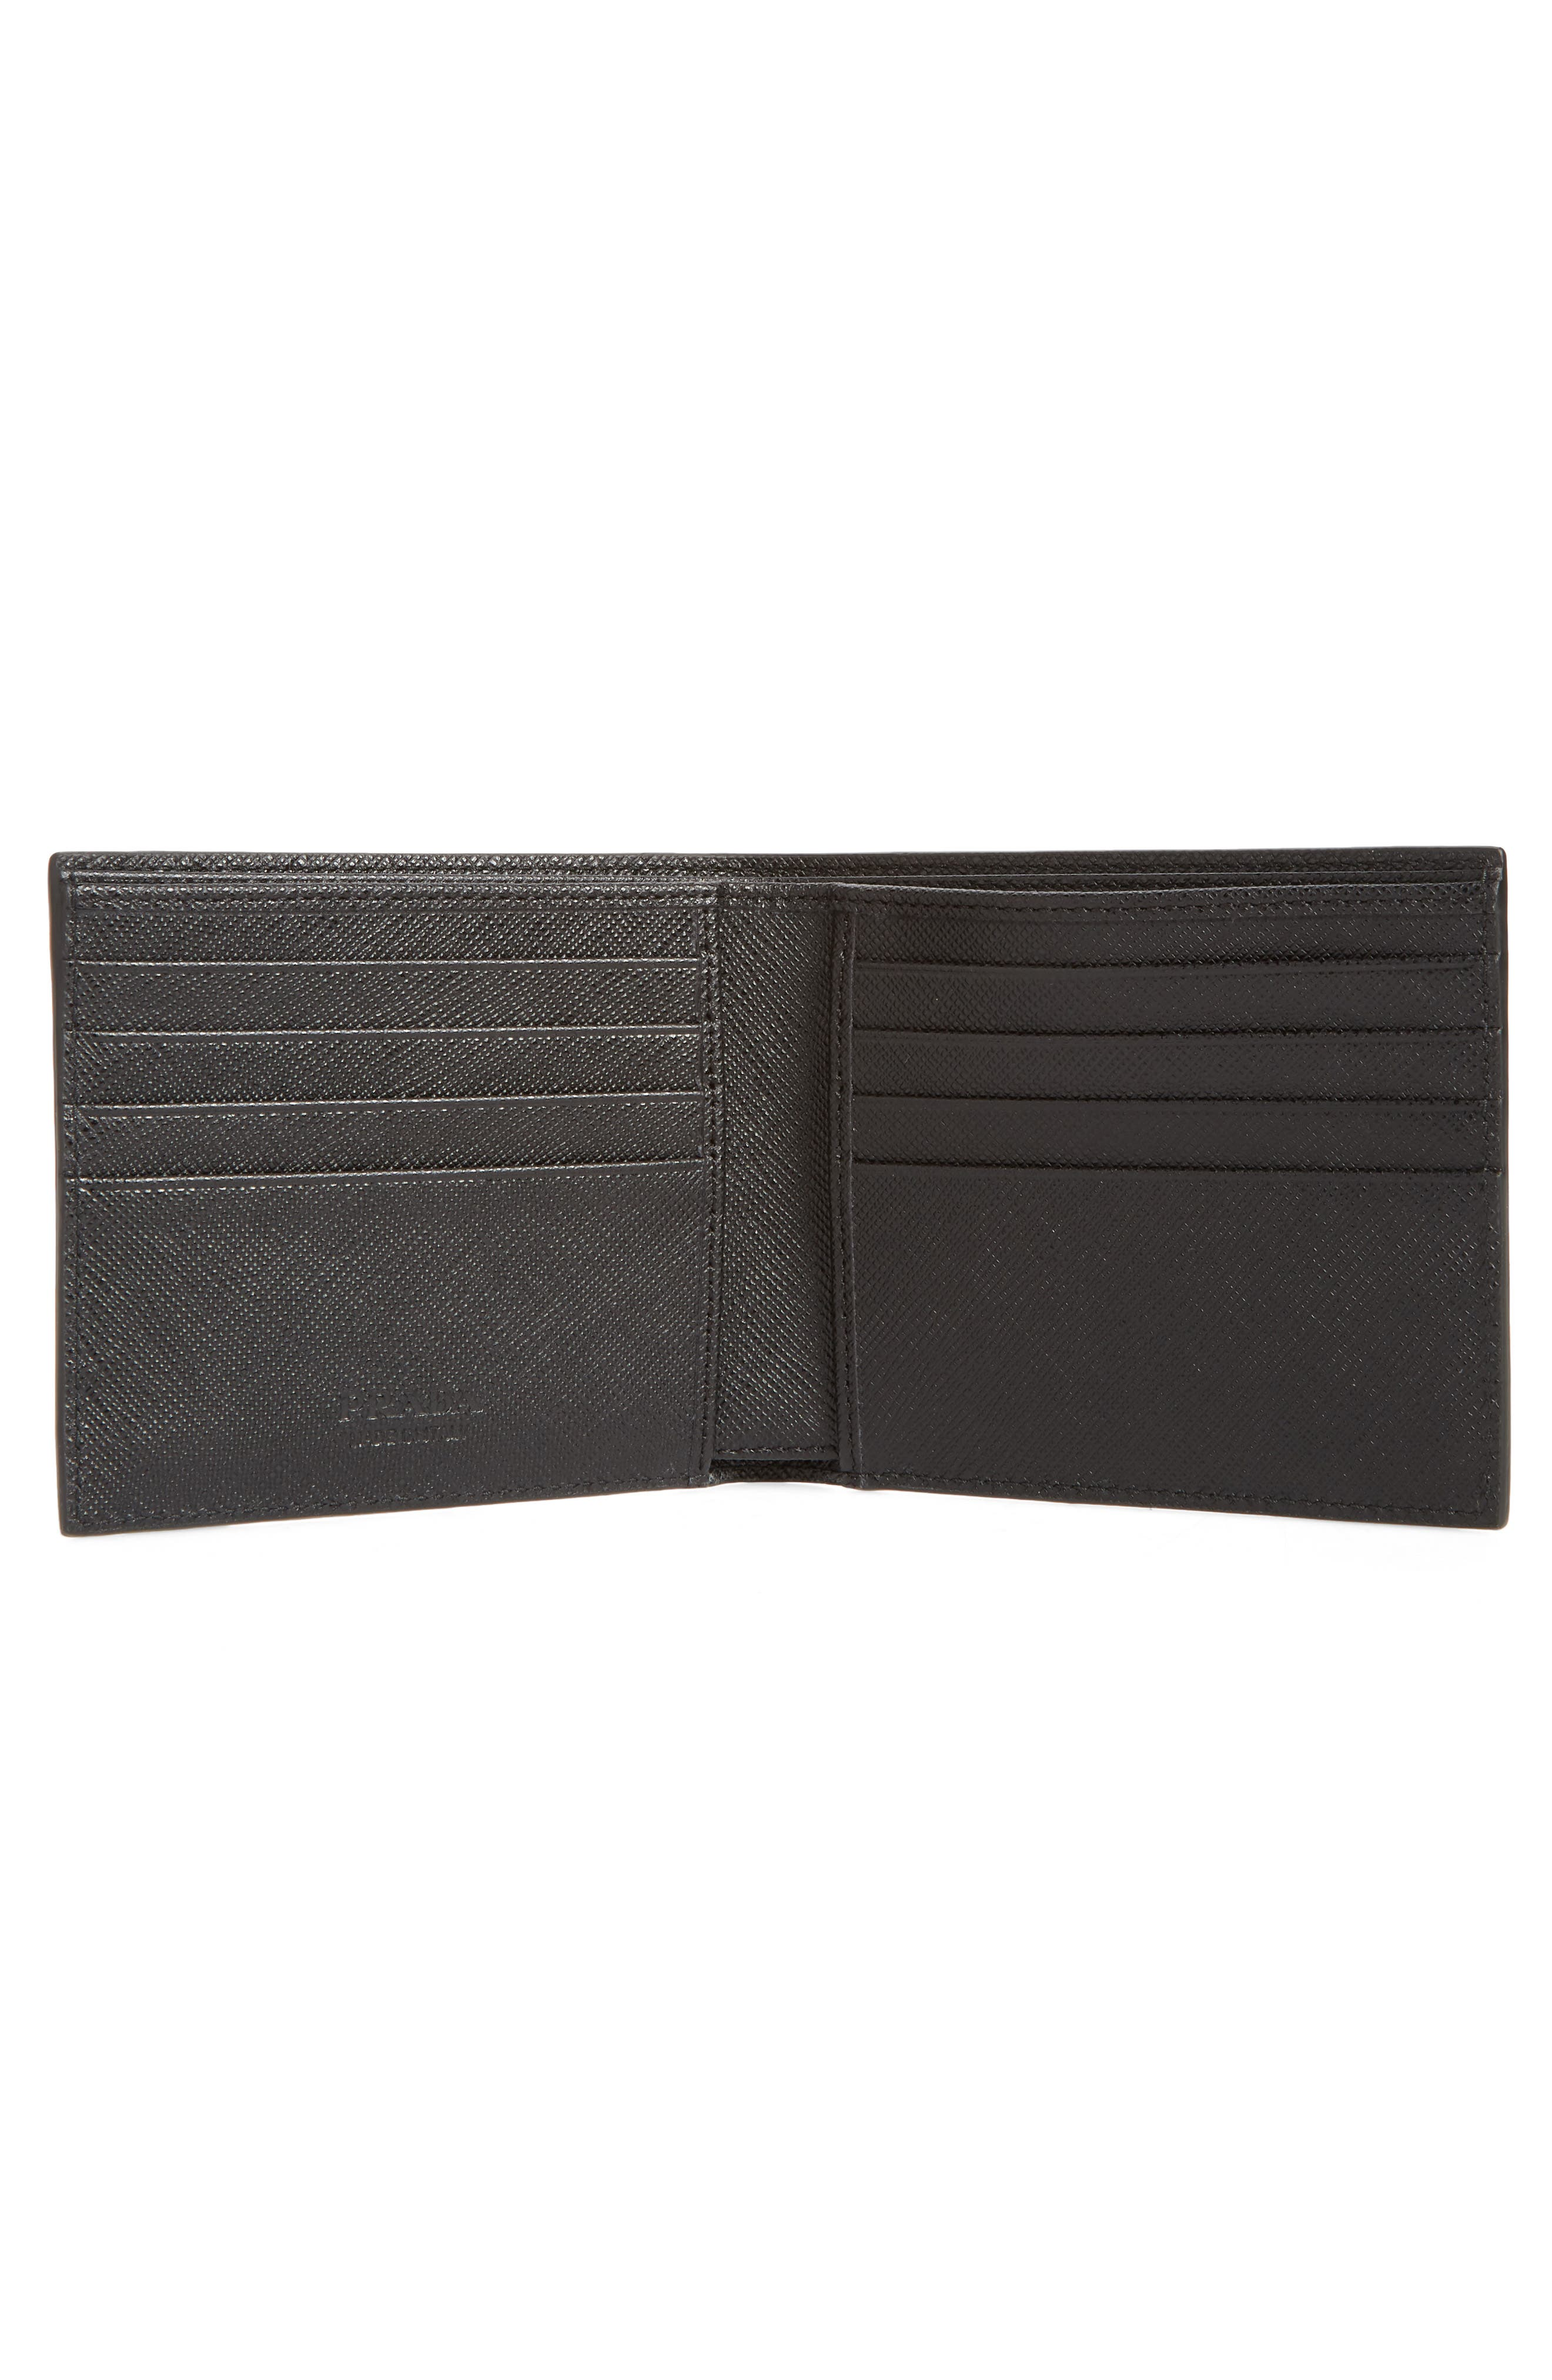 Alternate Image 2  - Prada Arrow Calfskin Leather Wallet